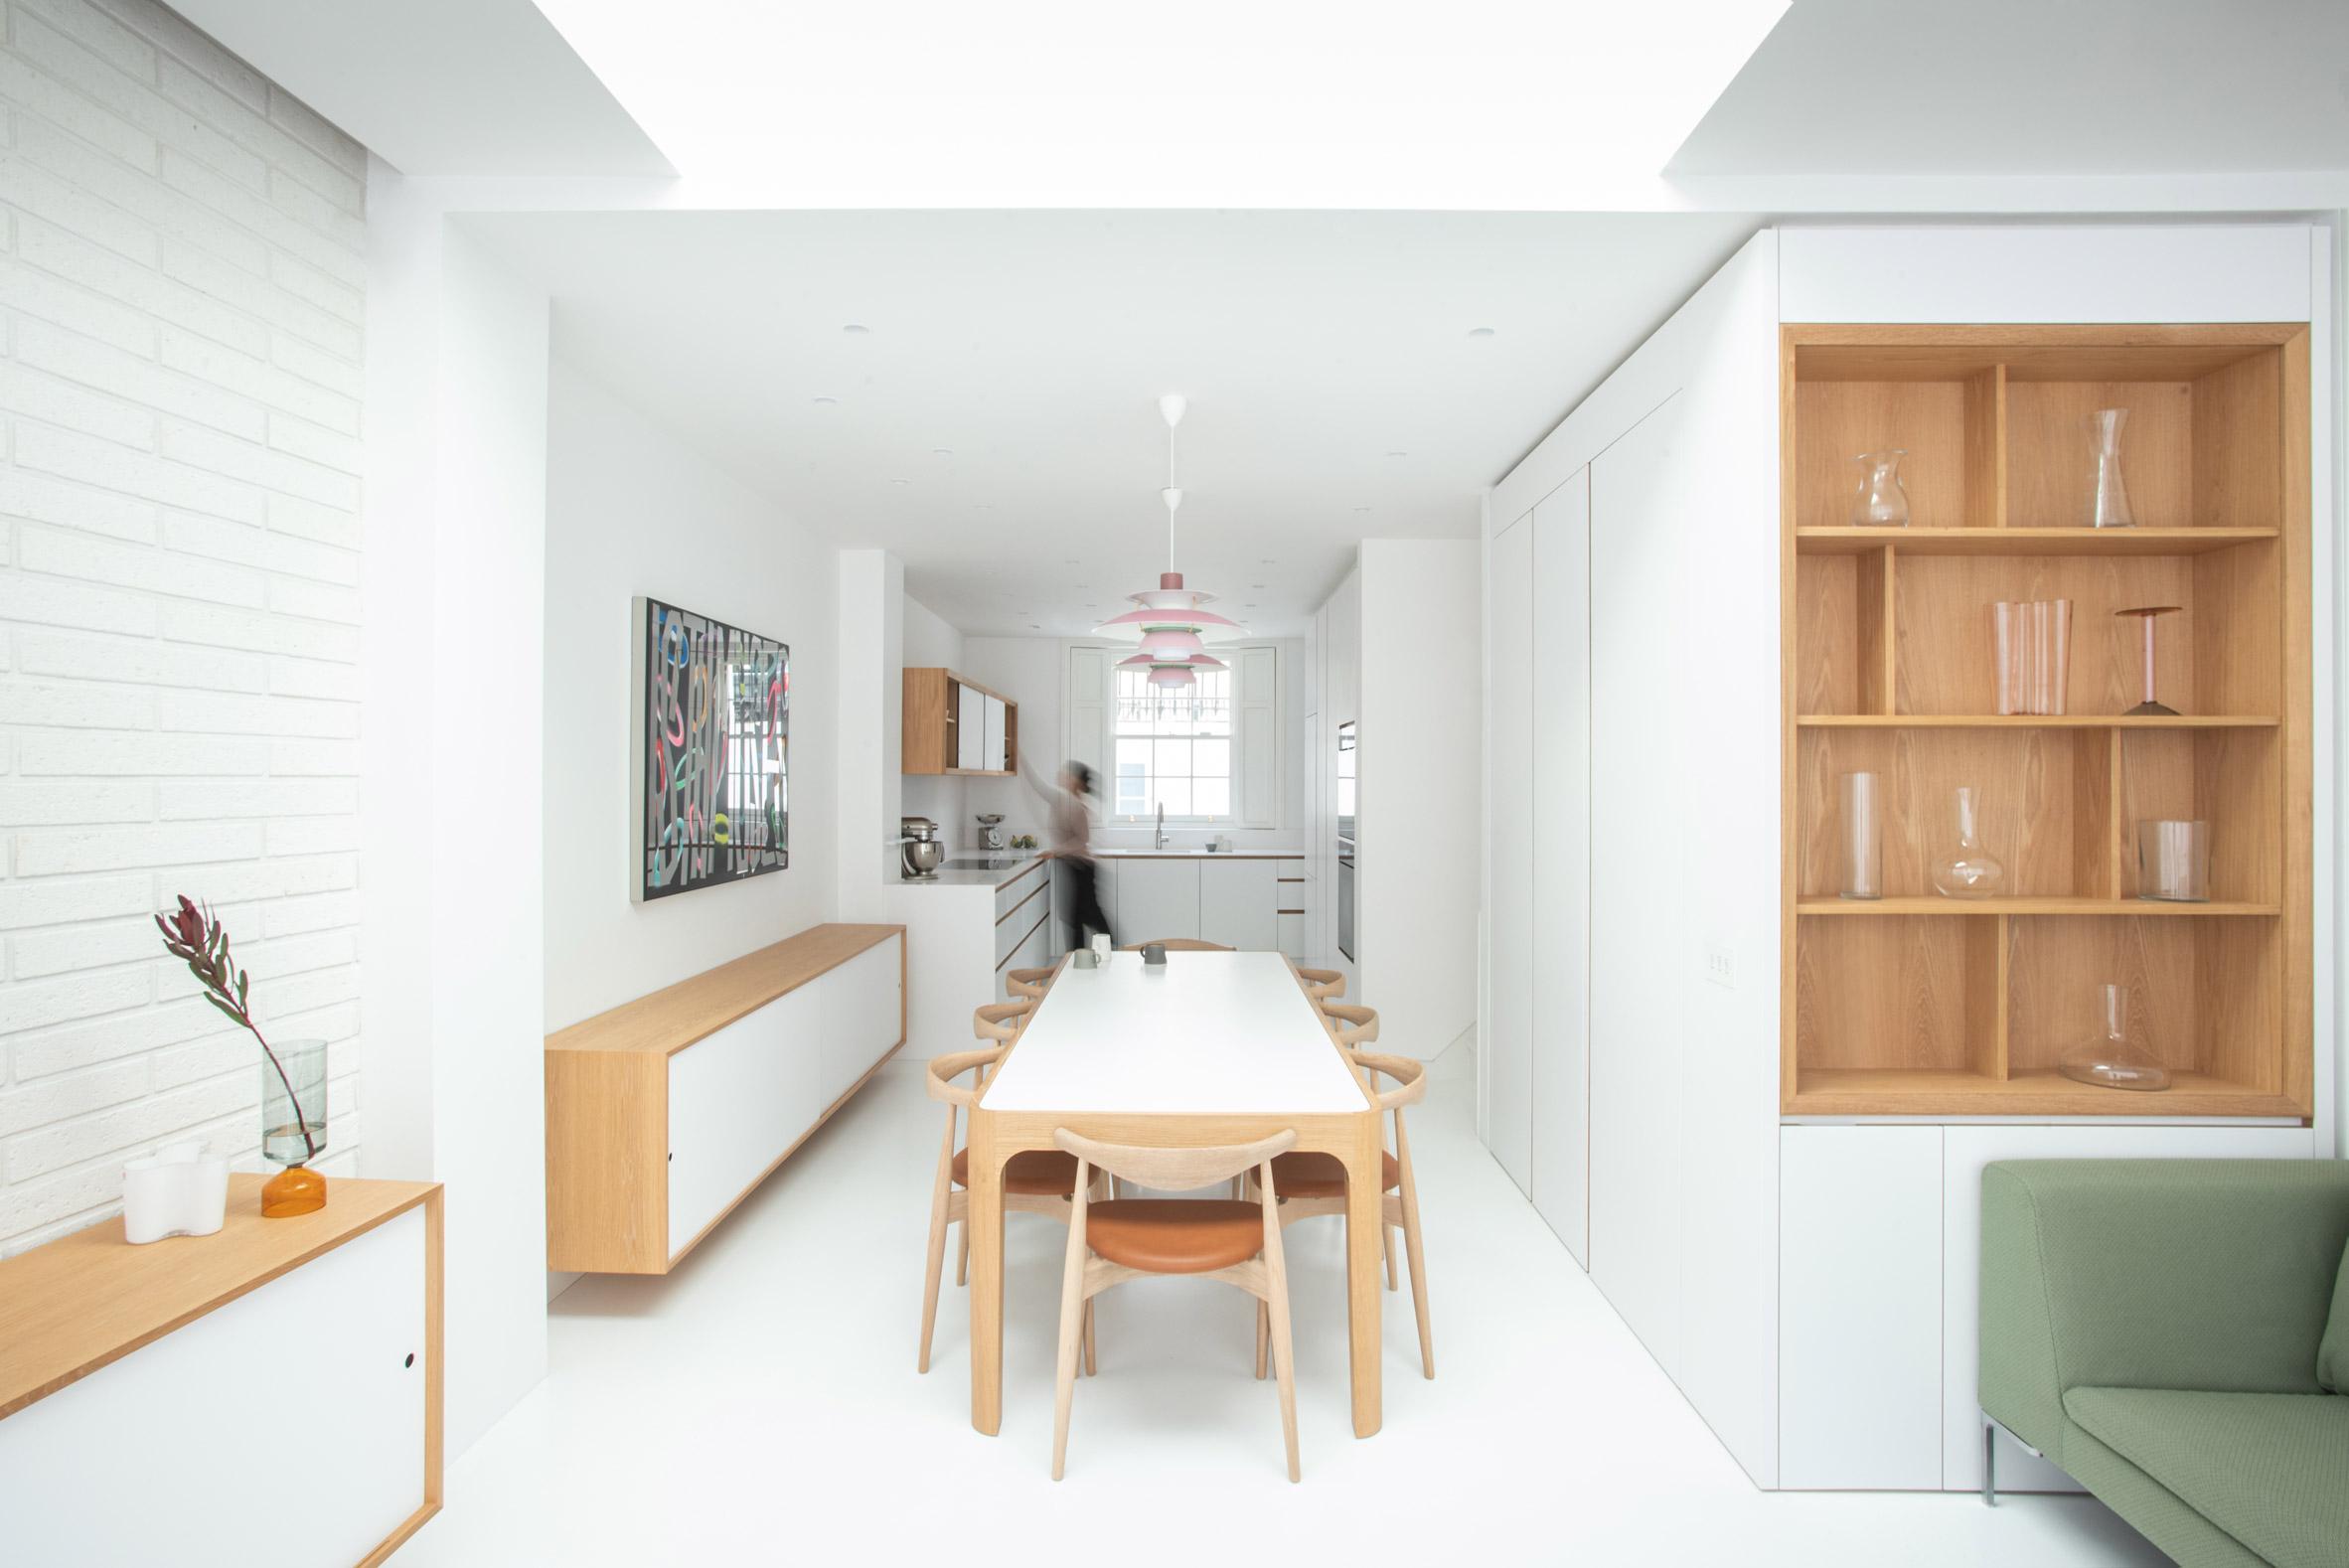 Rydon Street by Moxon Architects